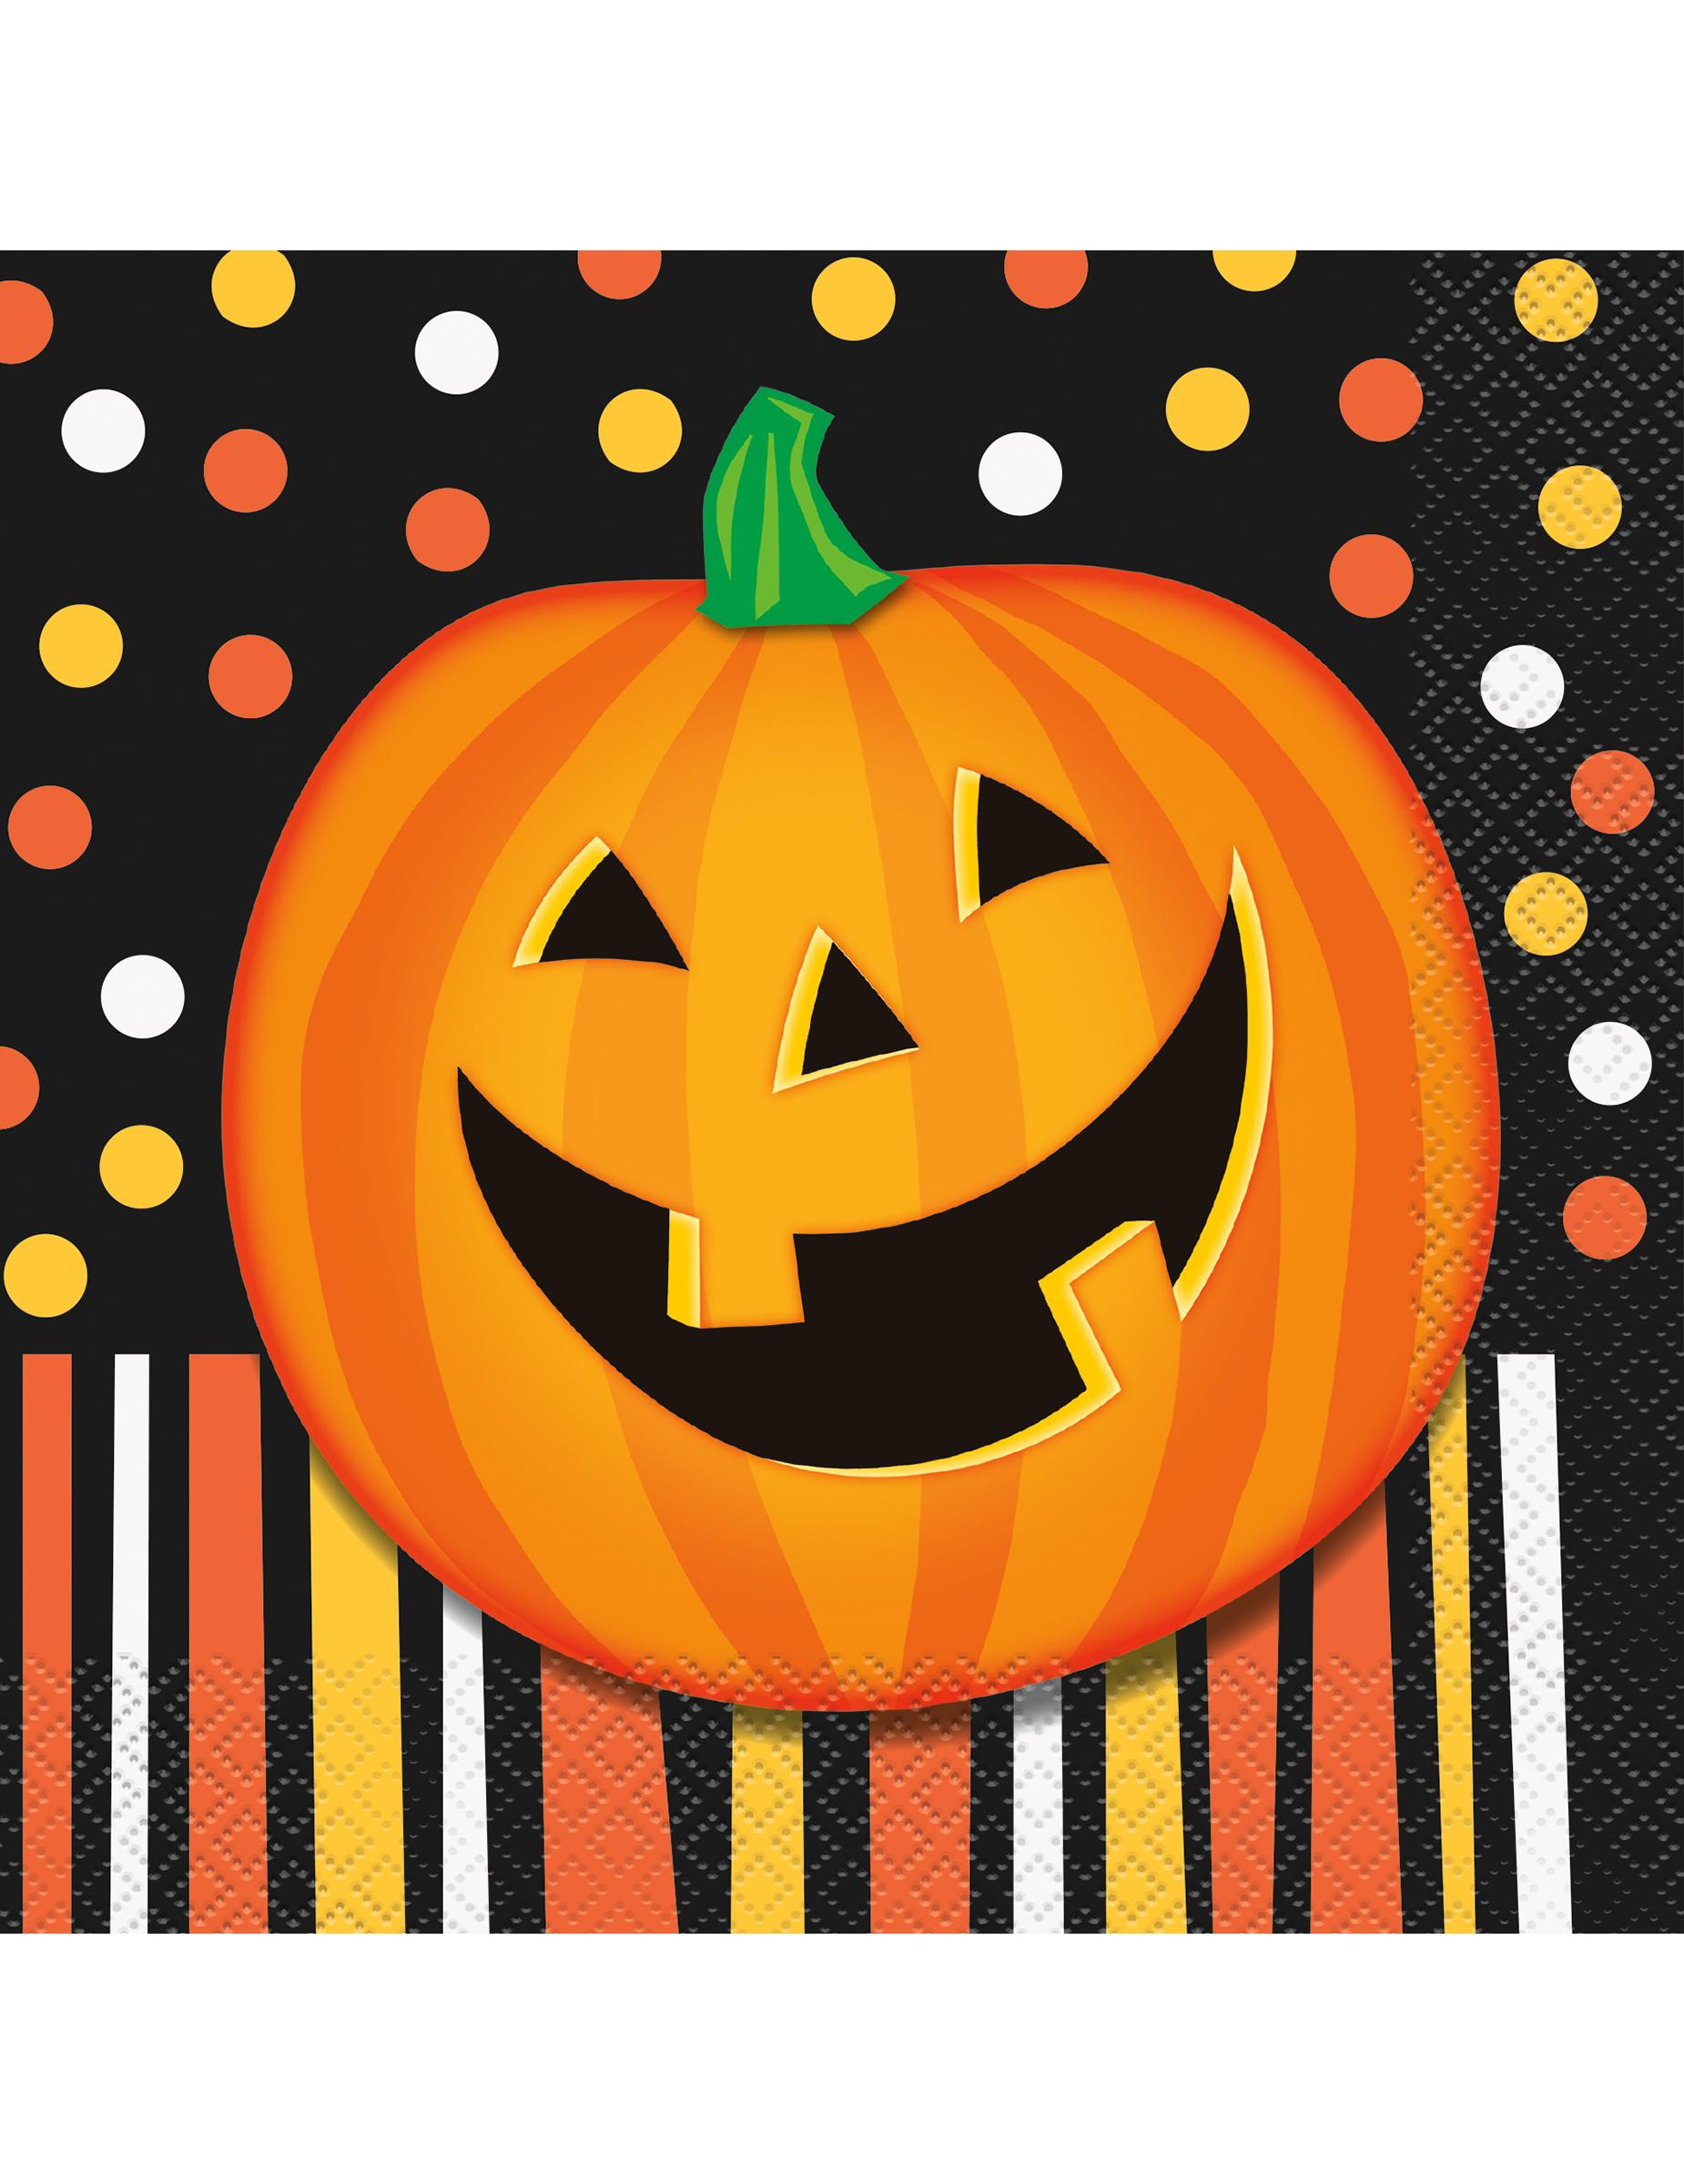 Pompoen Halloween.16 Pompoen Halloween Servetten